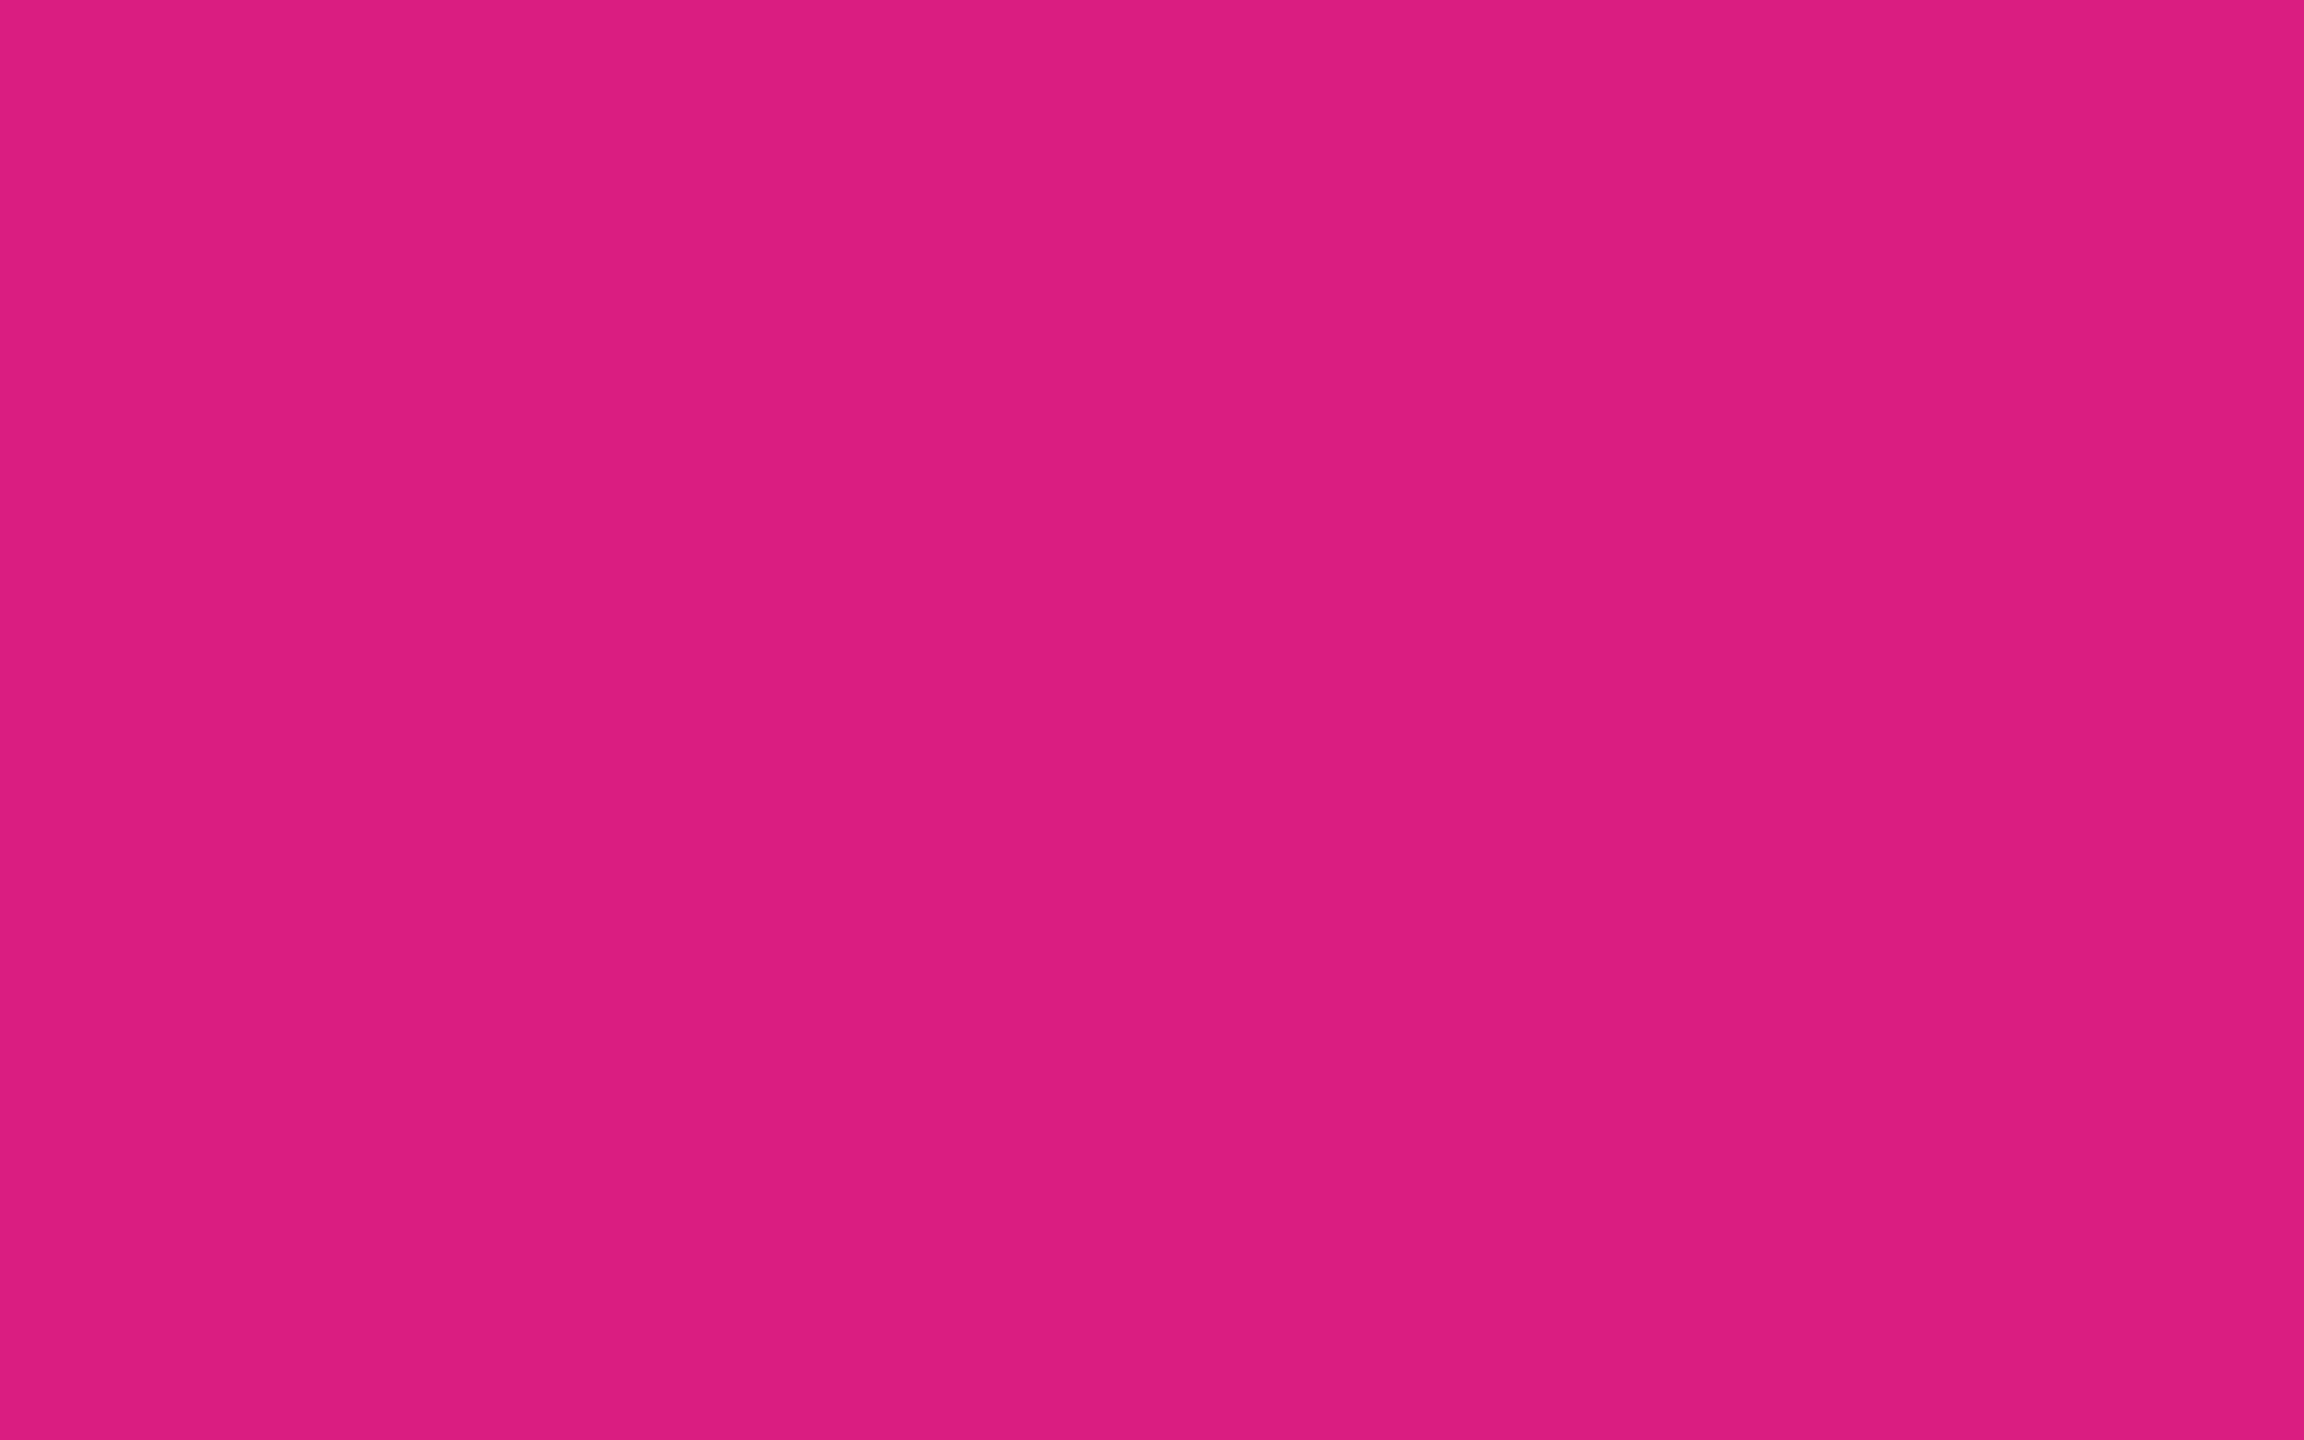 2304x1440 Vivid Cerise Solid Color Background